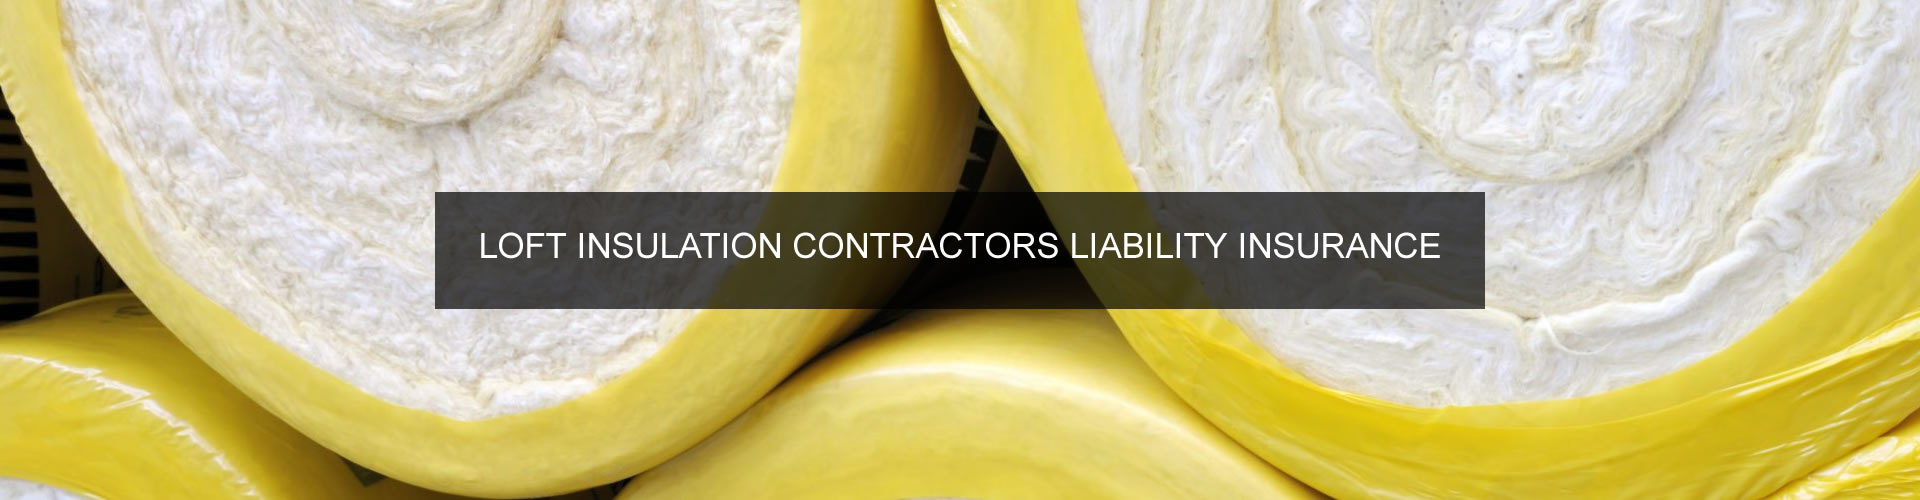 Loft Insulation Contractors Liability Insurance